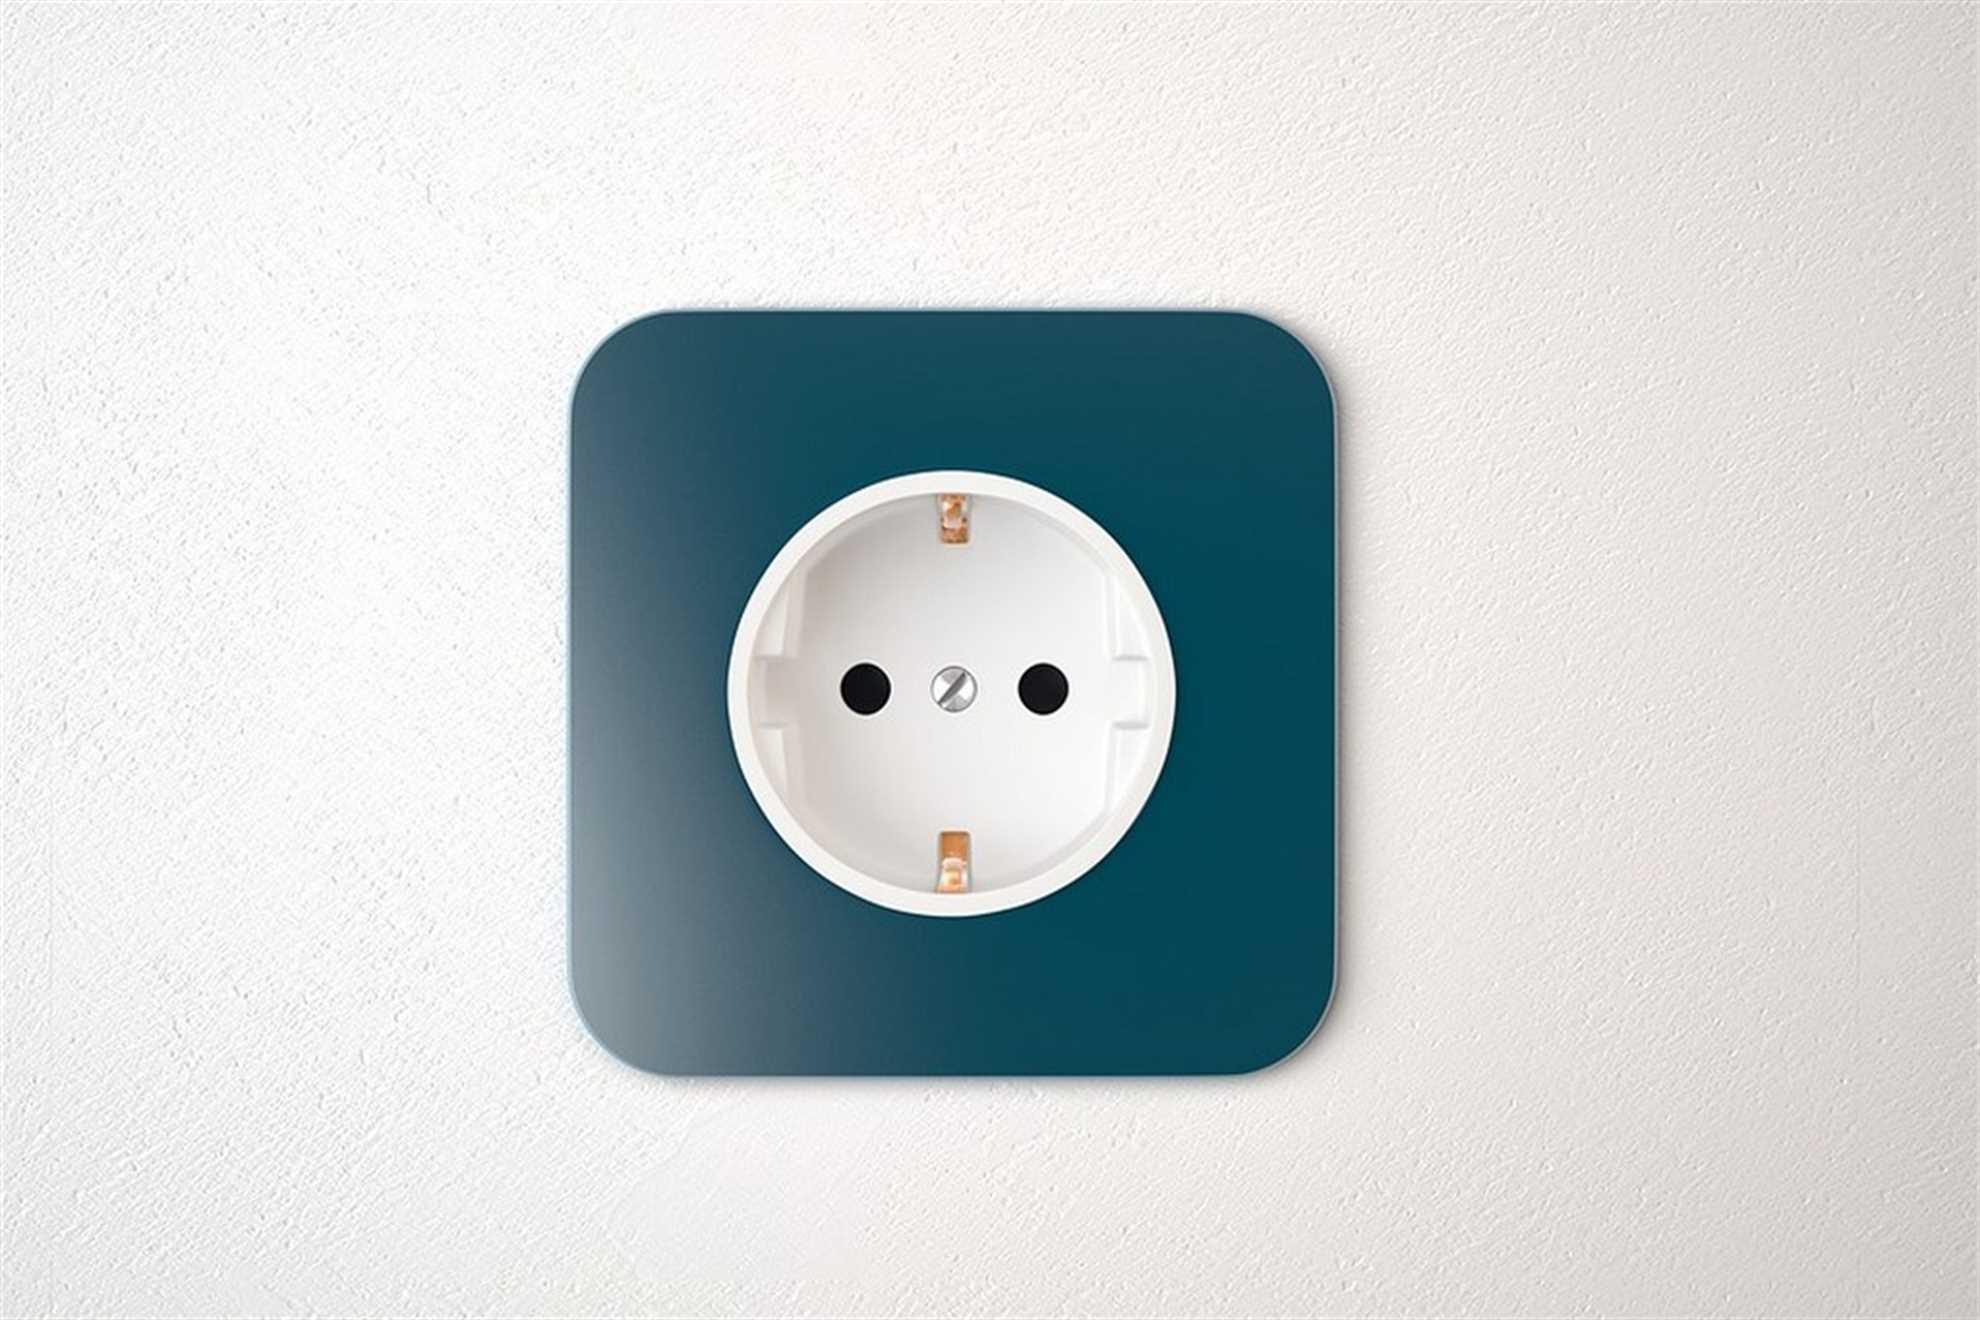 Electric socket in Croatia